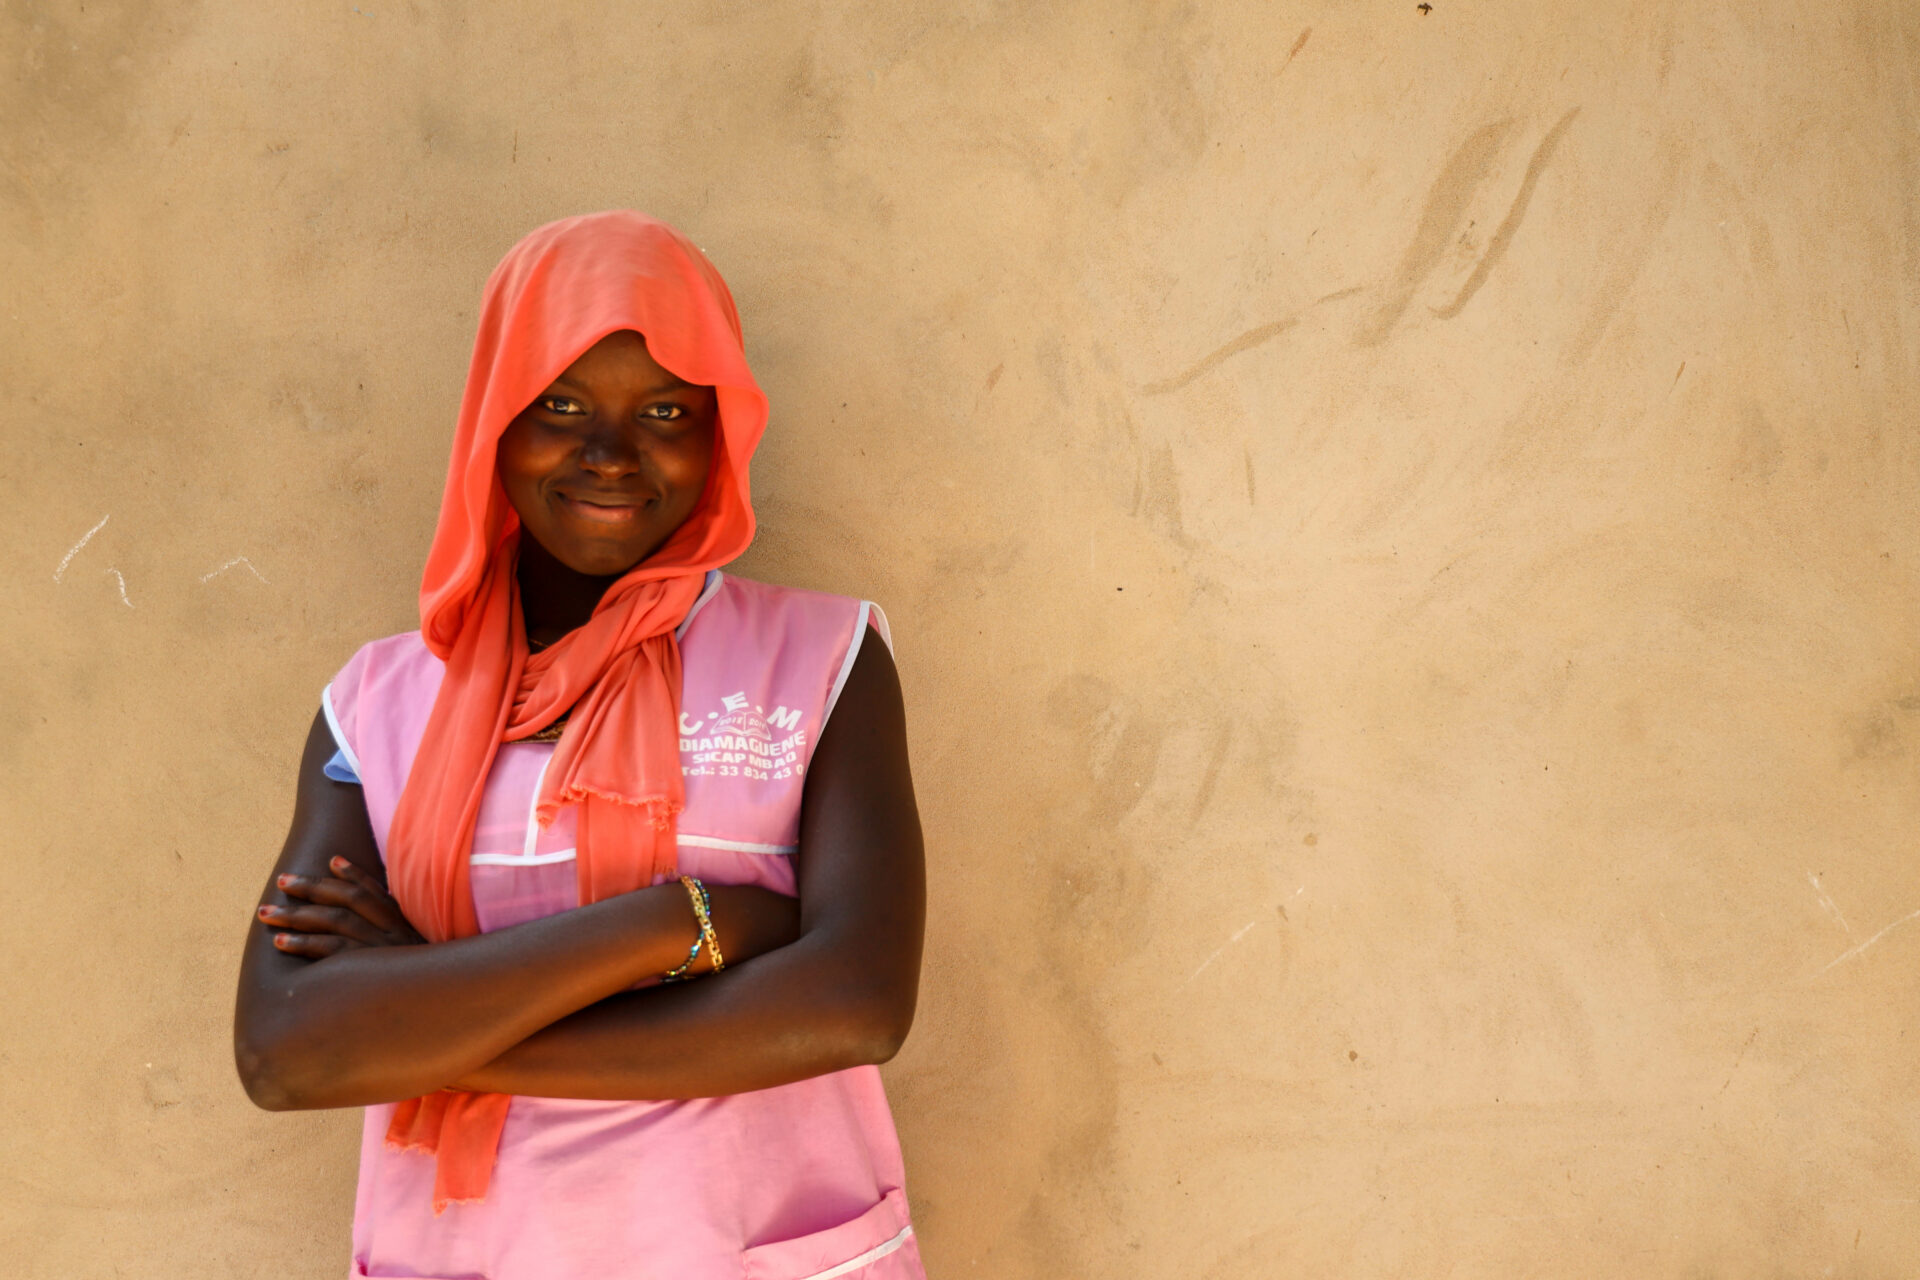 Senegal Plan International mission with influencer Charlotte Noël